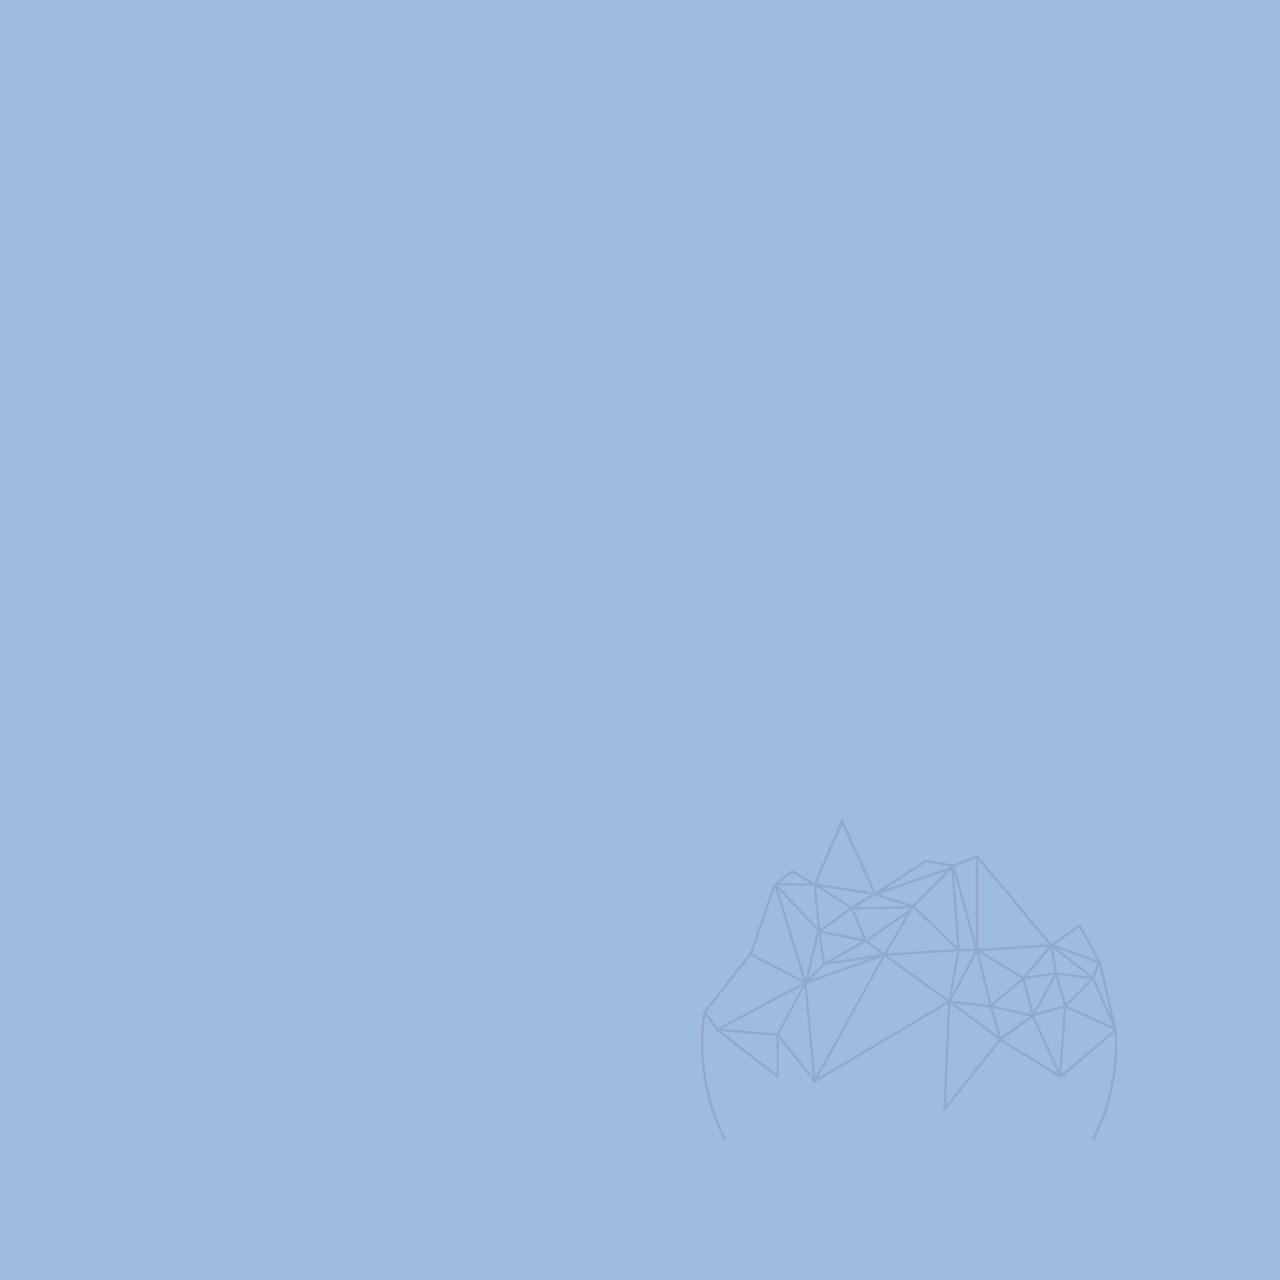 Weber Color Perfect Azur 2 KG - Flexible wall & floor grout